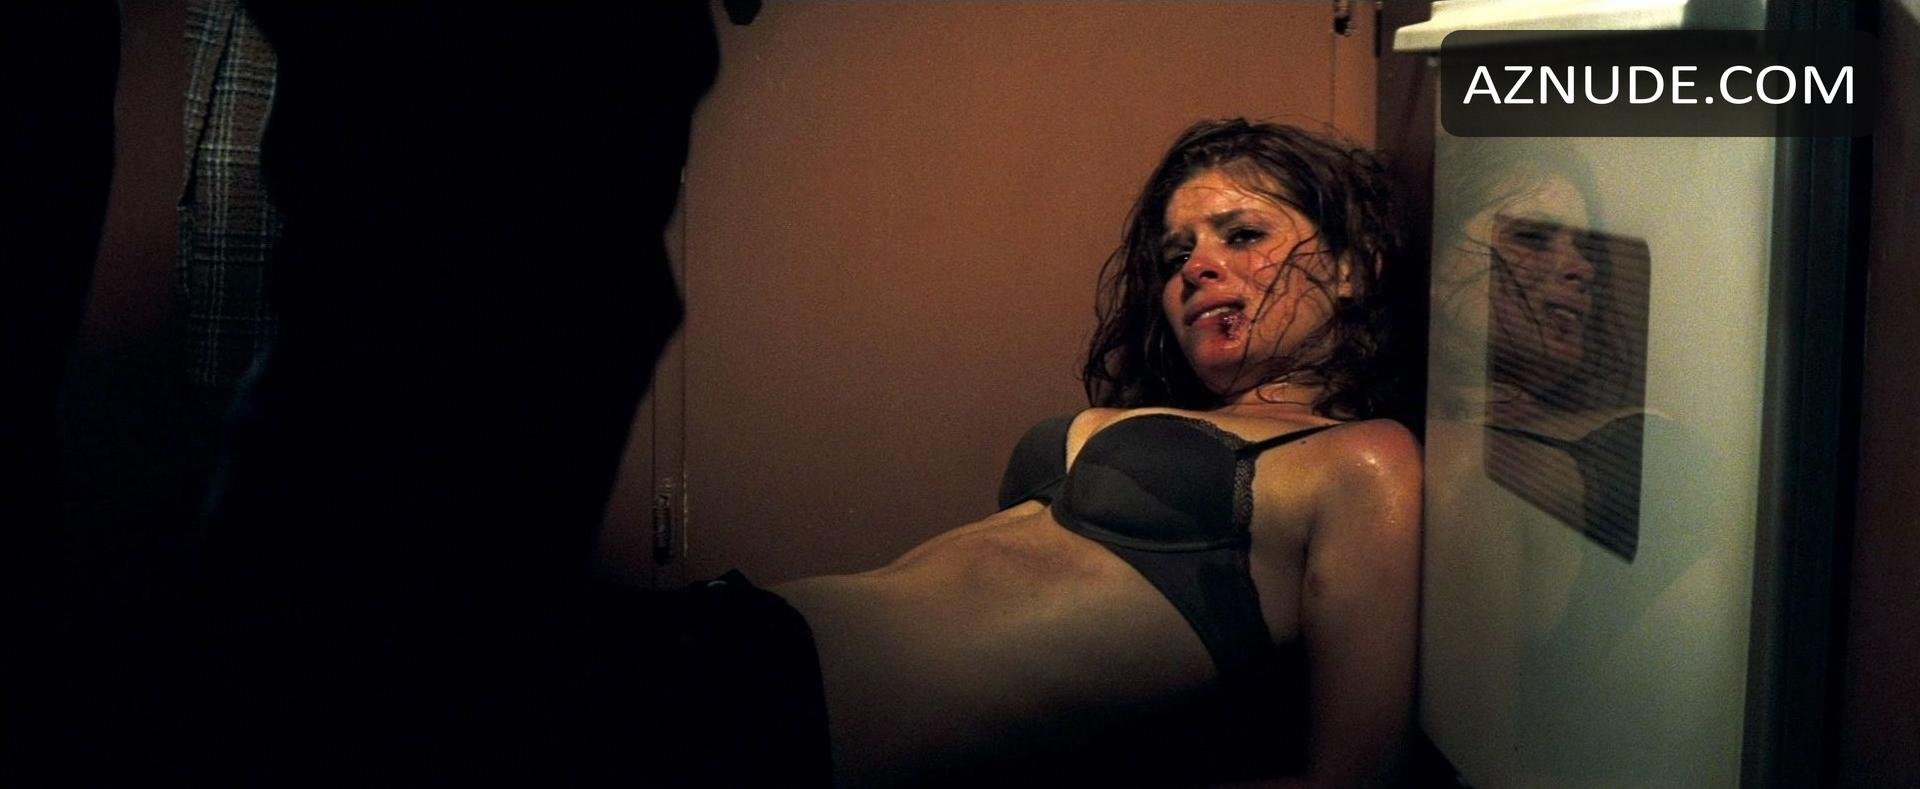 Emma roberts sex scene on scandalplanetcom - 3 part 4